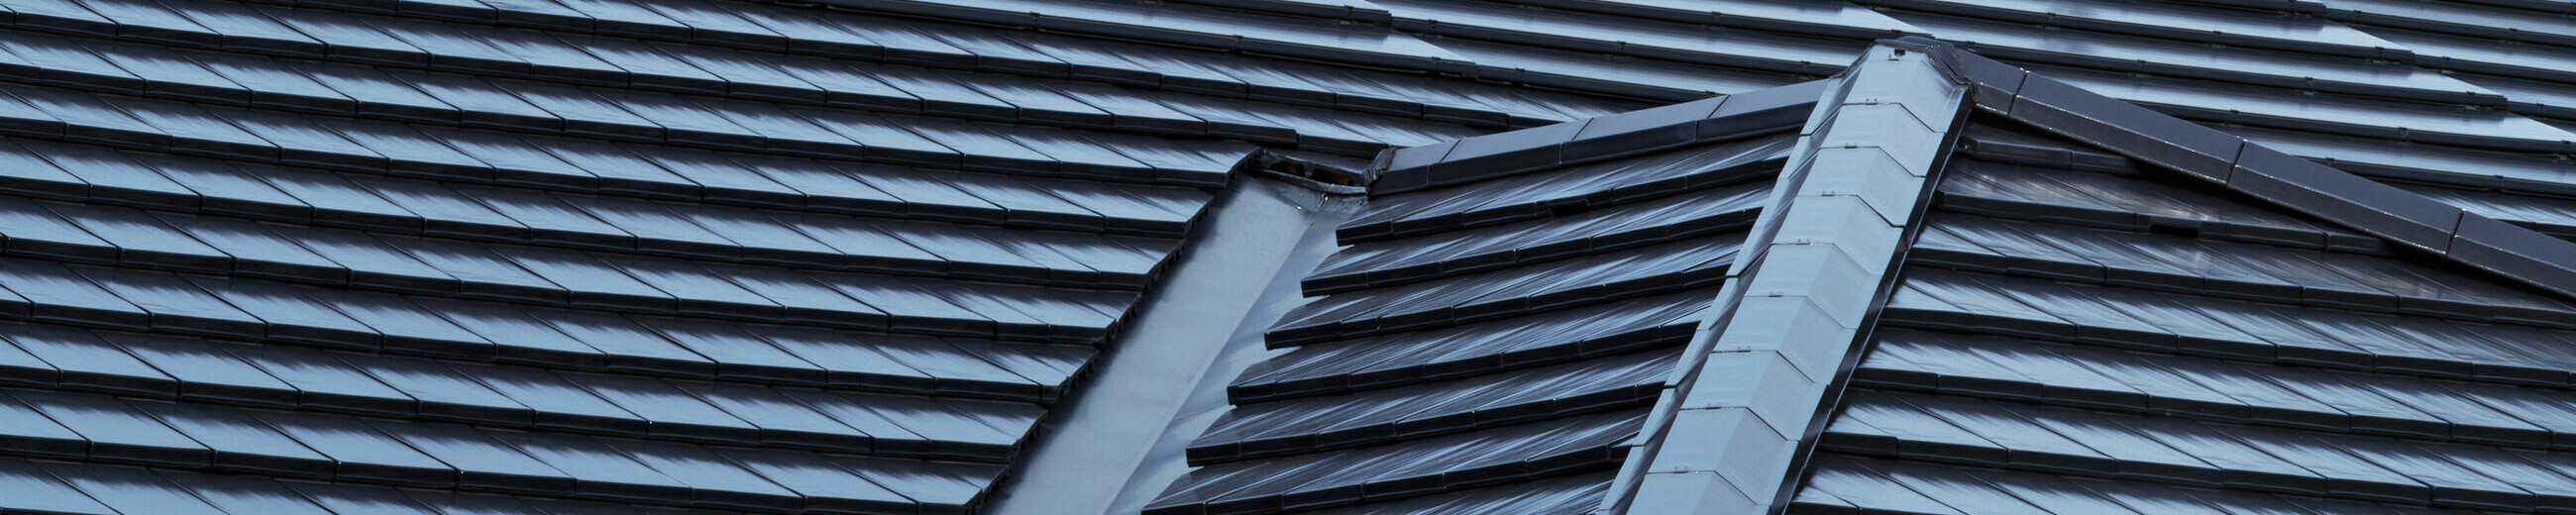 Dachówka ceramiczna DOMINO (płaska)